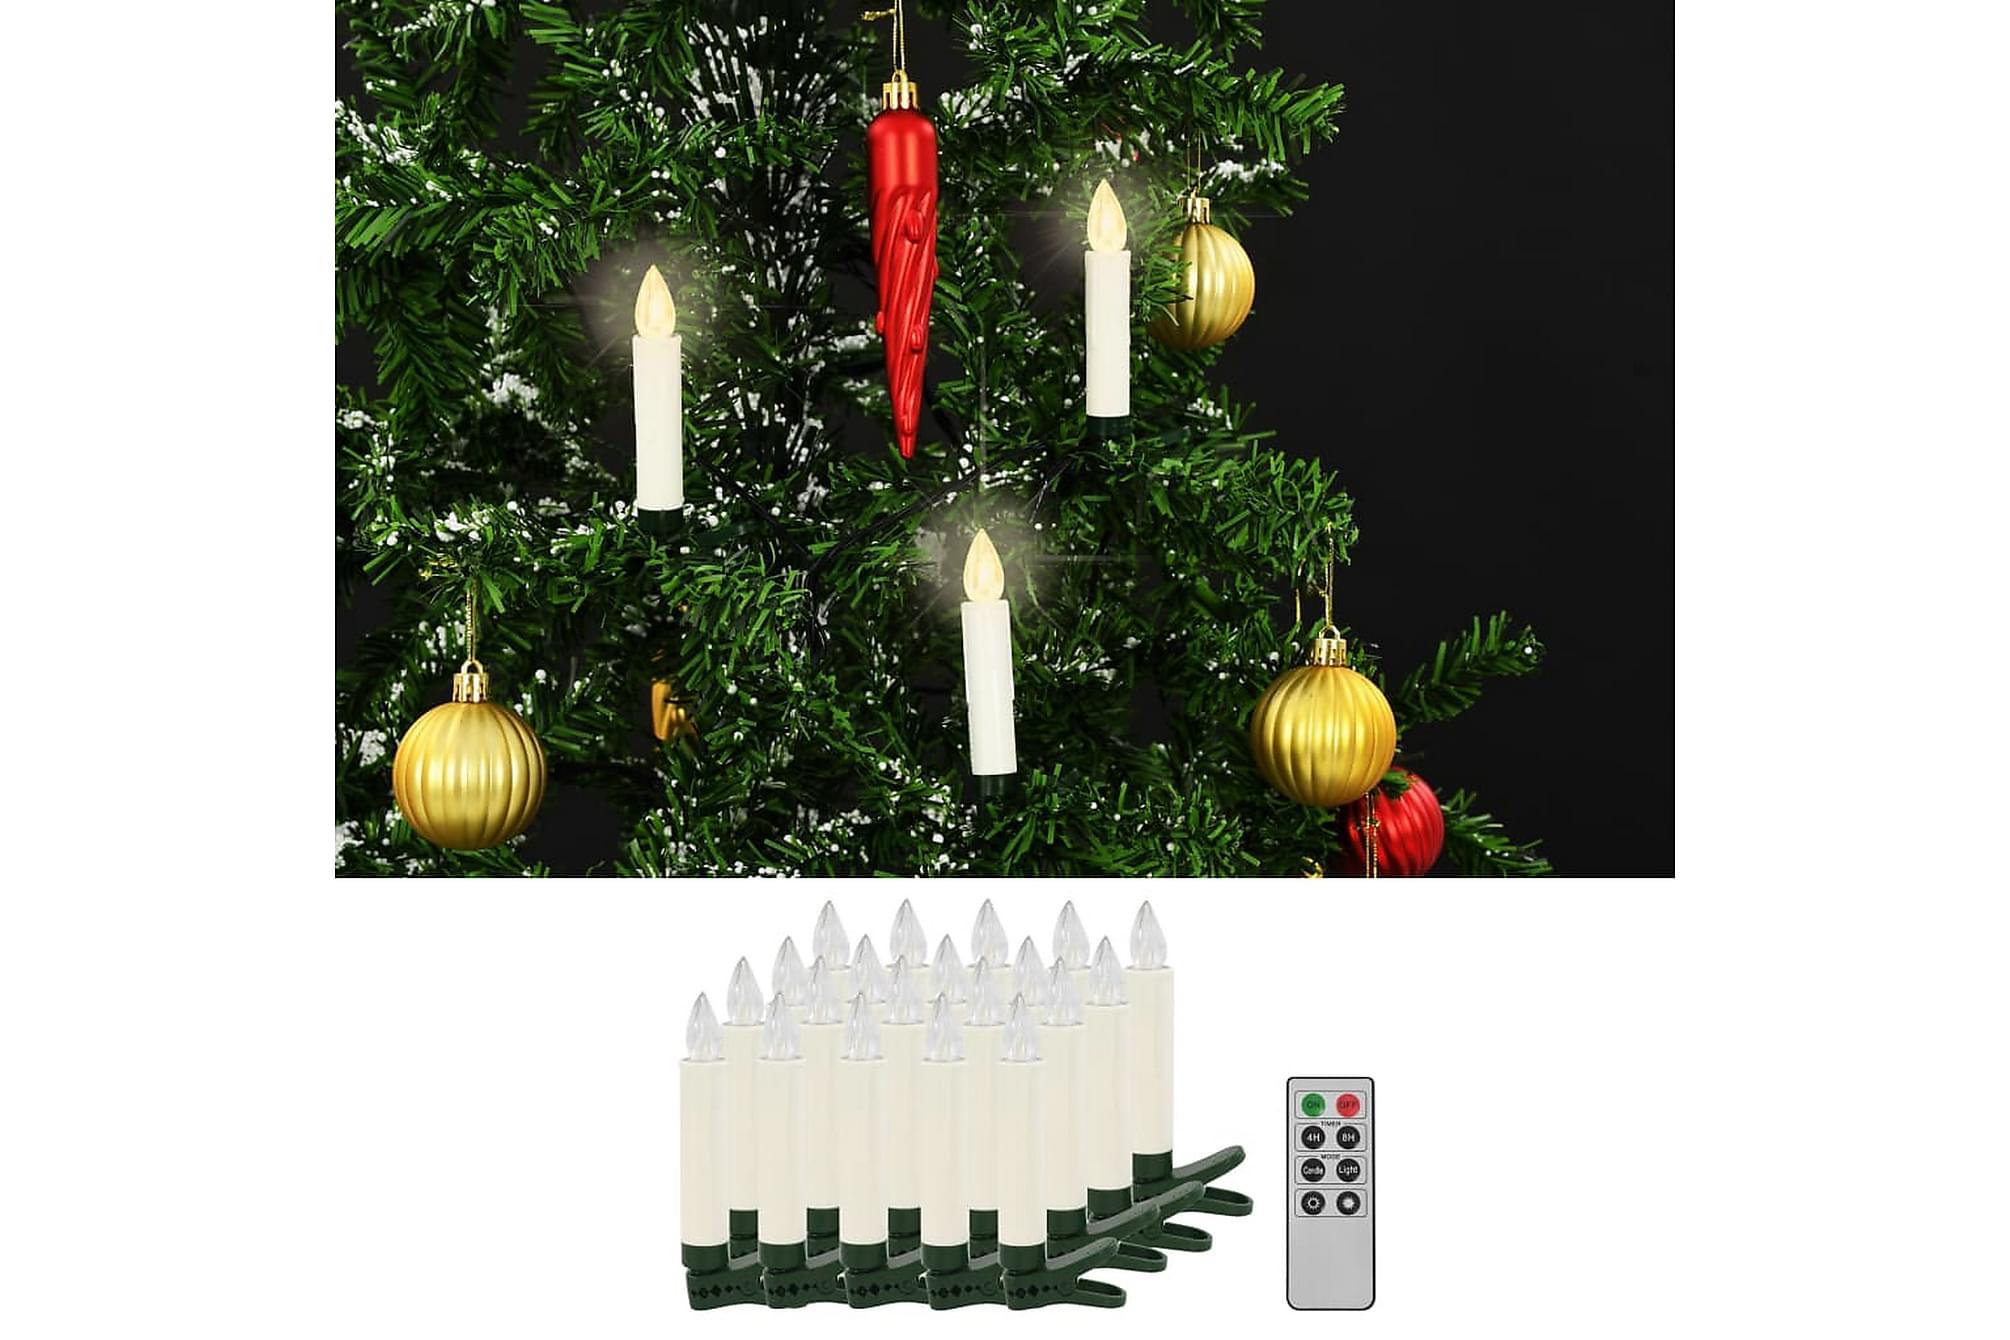 Trådlösa LED-ljus med fjärrkontroll 20 st varmvit